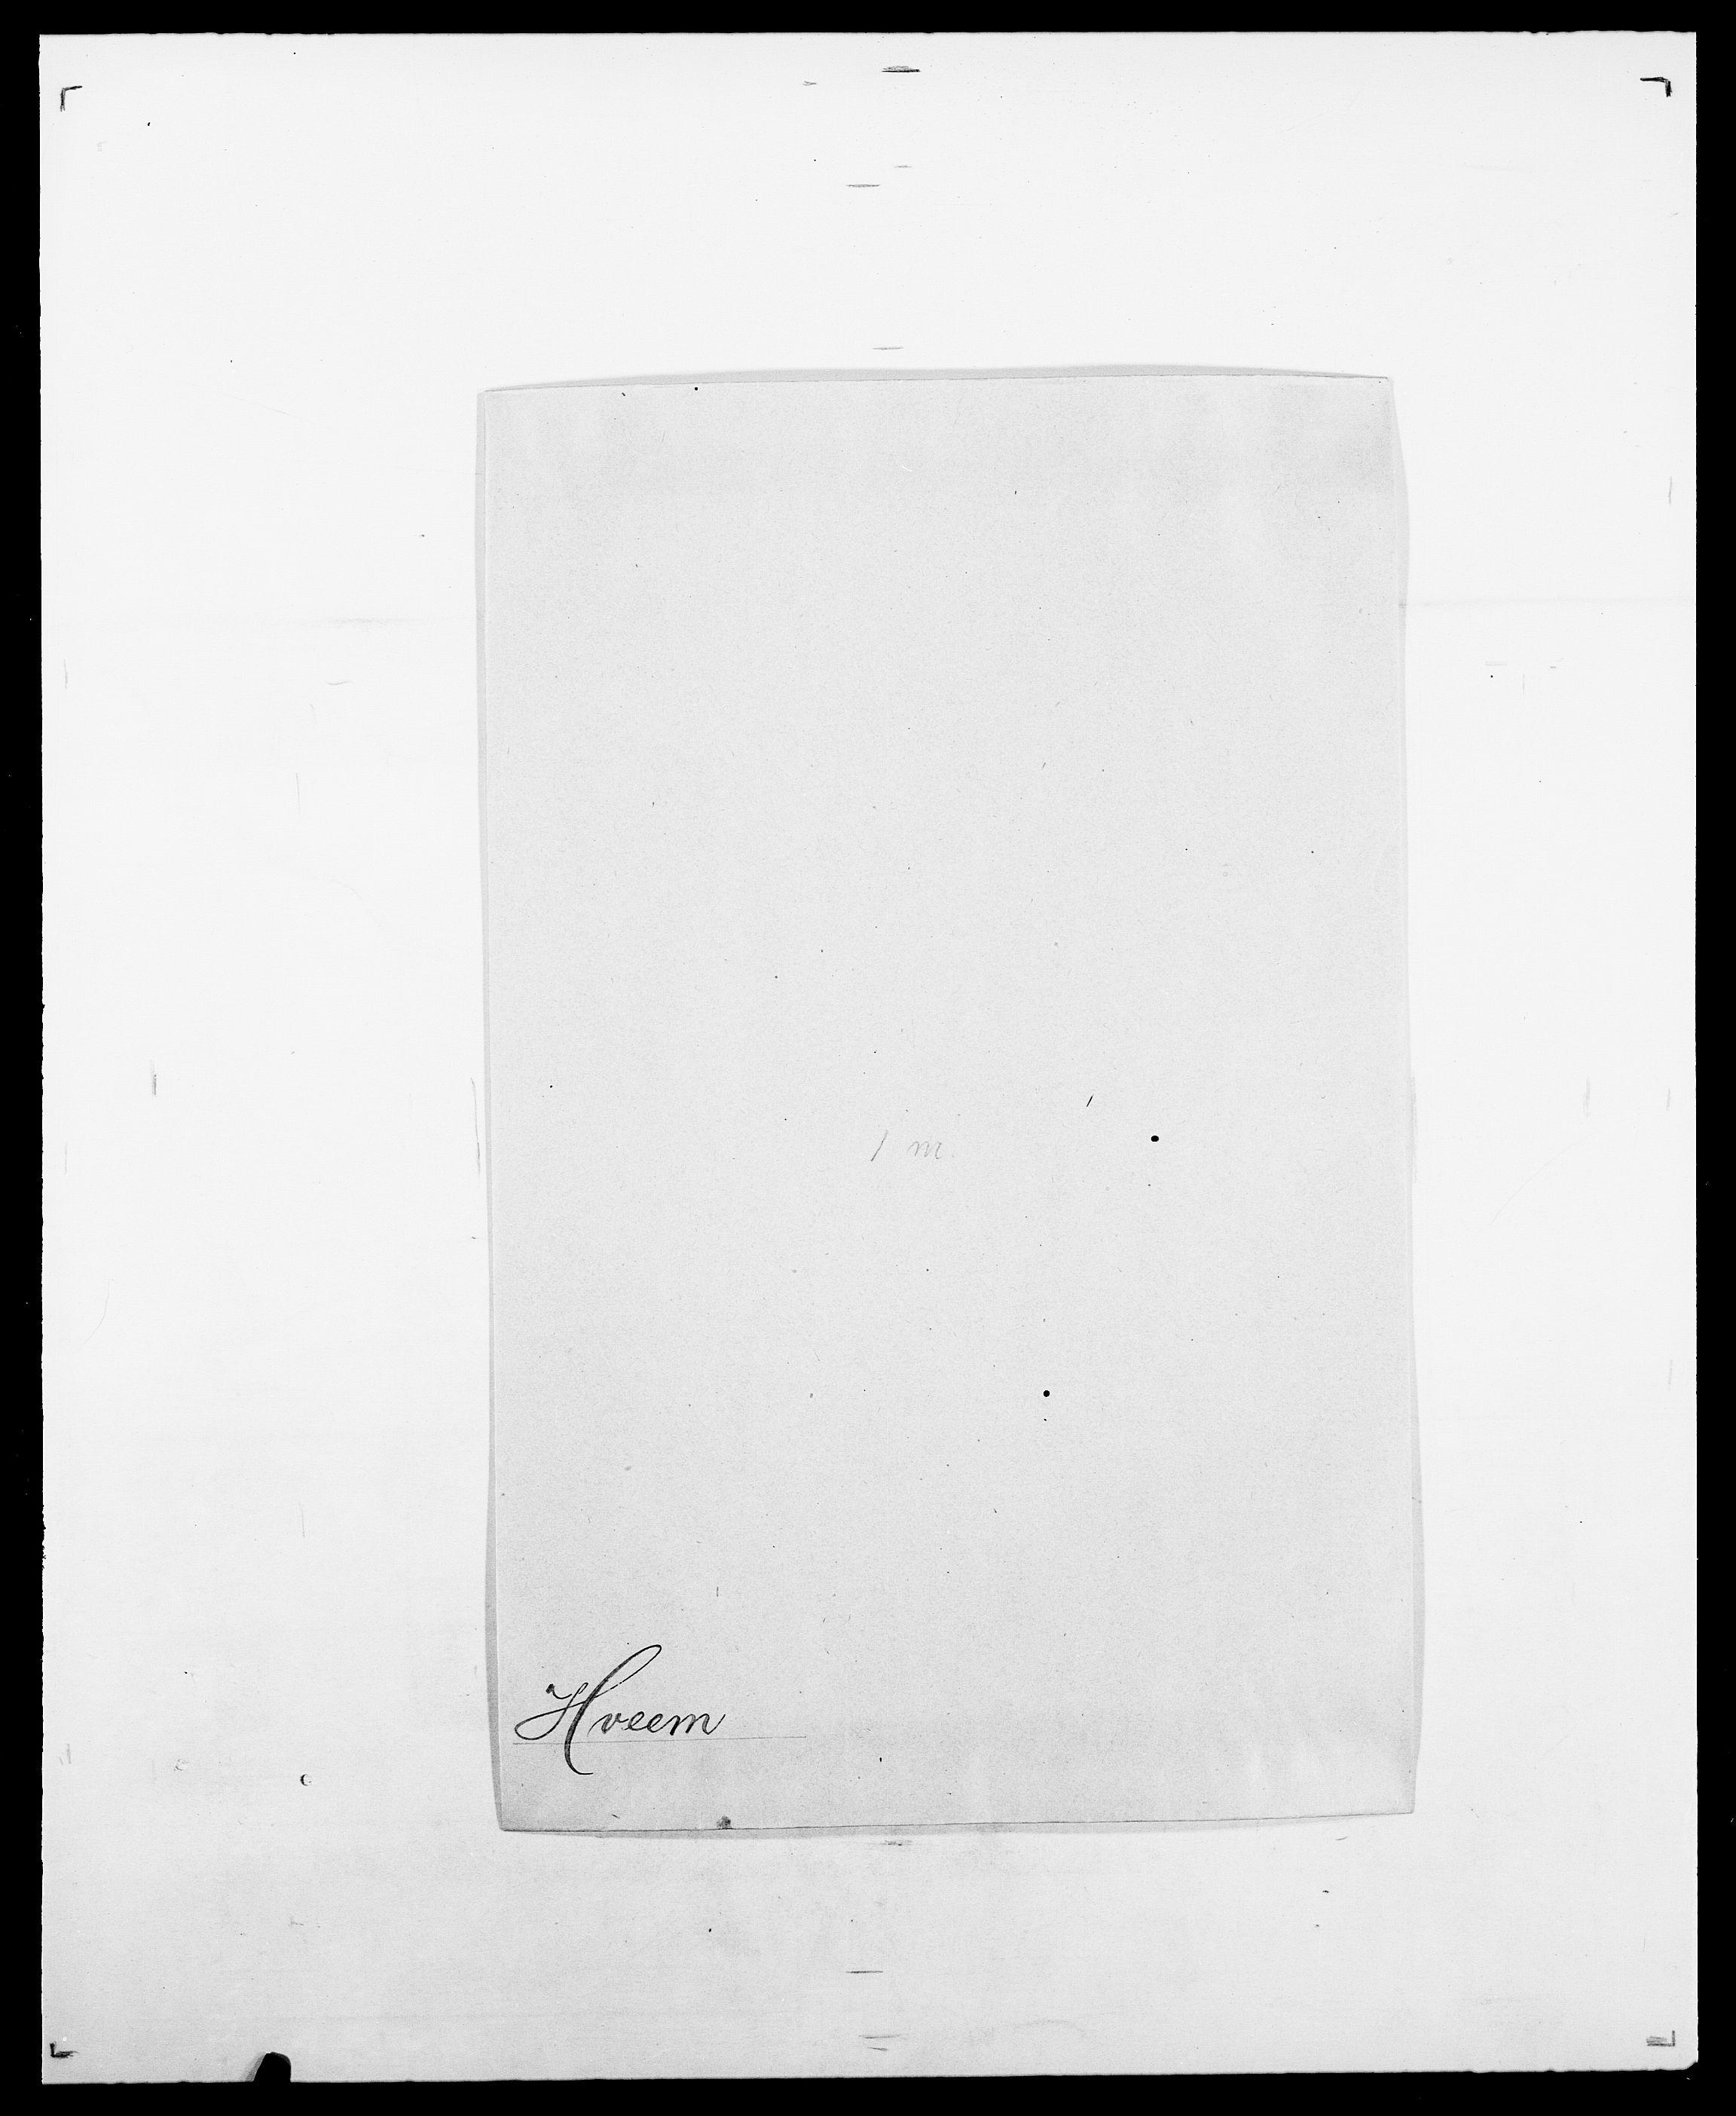 SAO, Delgobe, Charles Antoine - samling, D/Da/L0019: van der Hude - Joys, s. 144